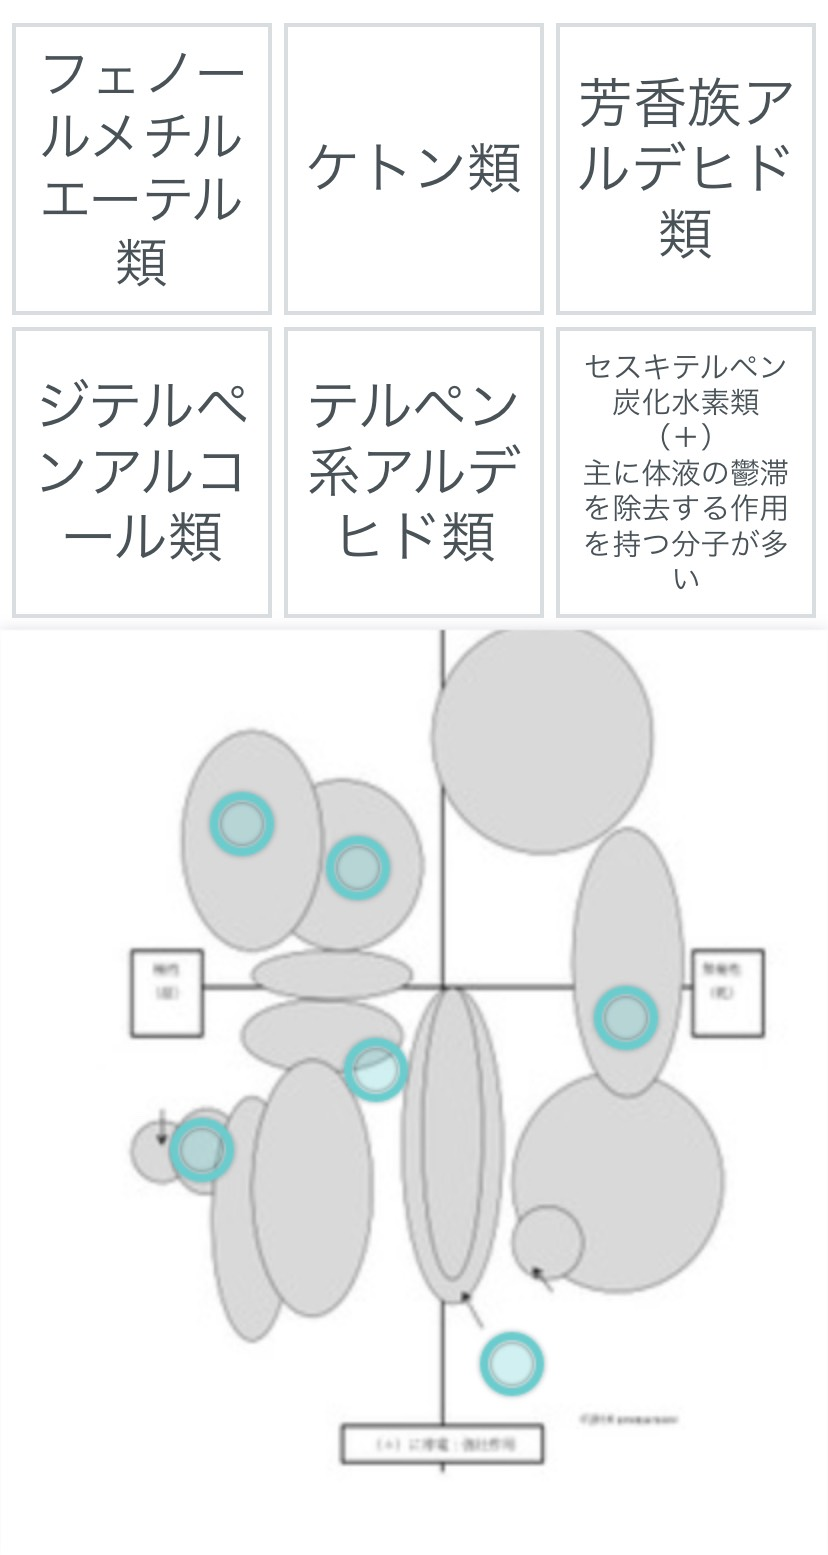 quizlet(アロマクオーレ オリジナル)